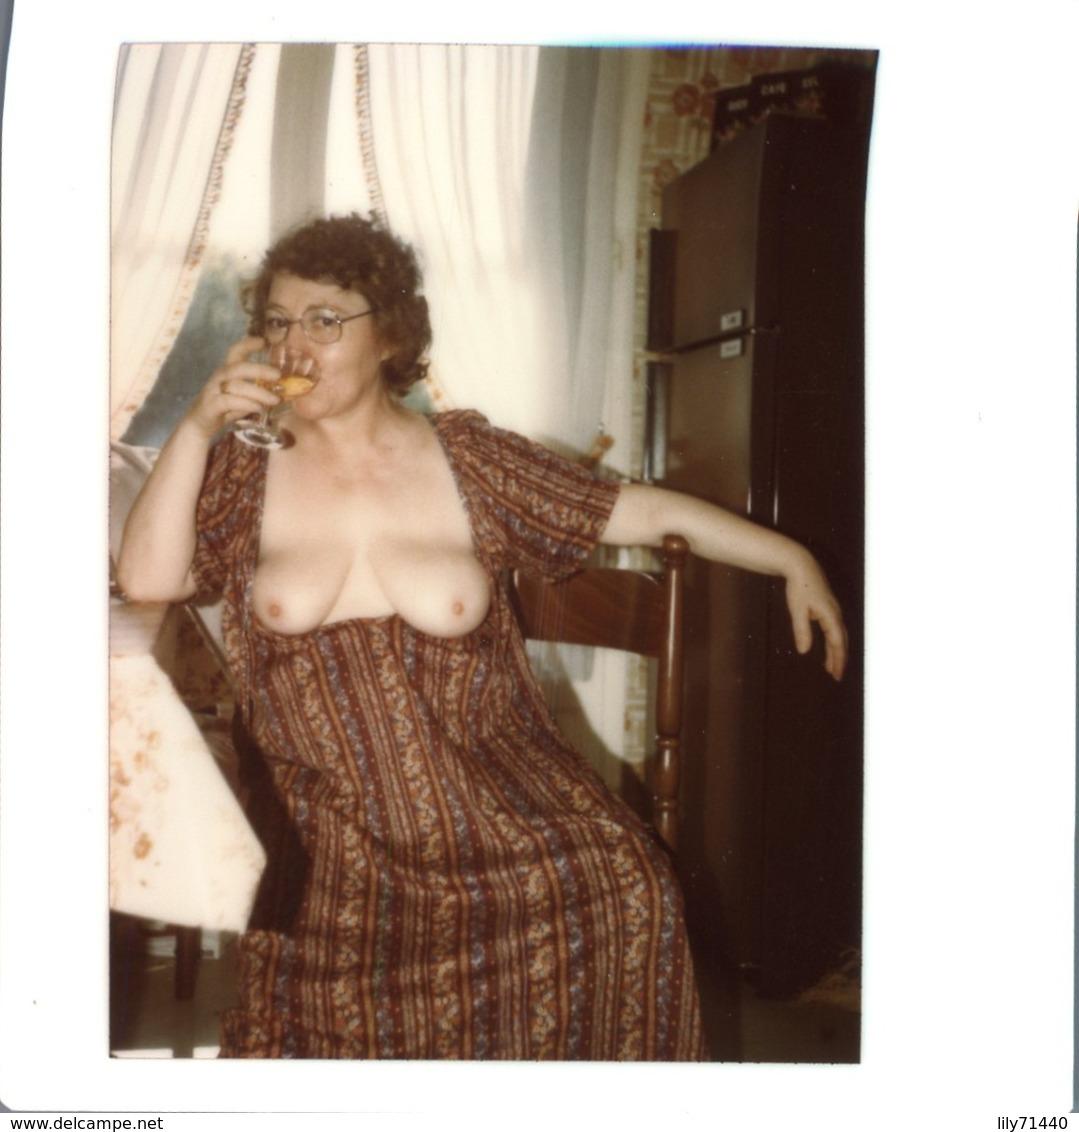 PHOTO ORIGINALE AMATEUR POLAROID FEMME NU EROTISME EROTICISM NAKED WOMAN FEMME SEINS NUS NUDE CURIOSA - Belleza Feminina (1941-1960)